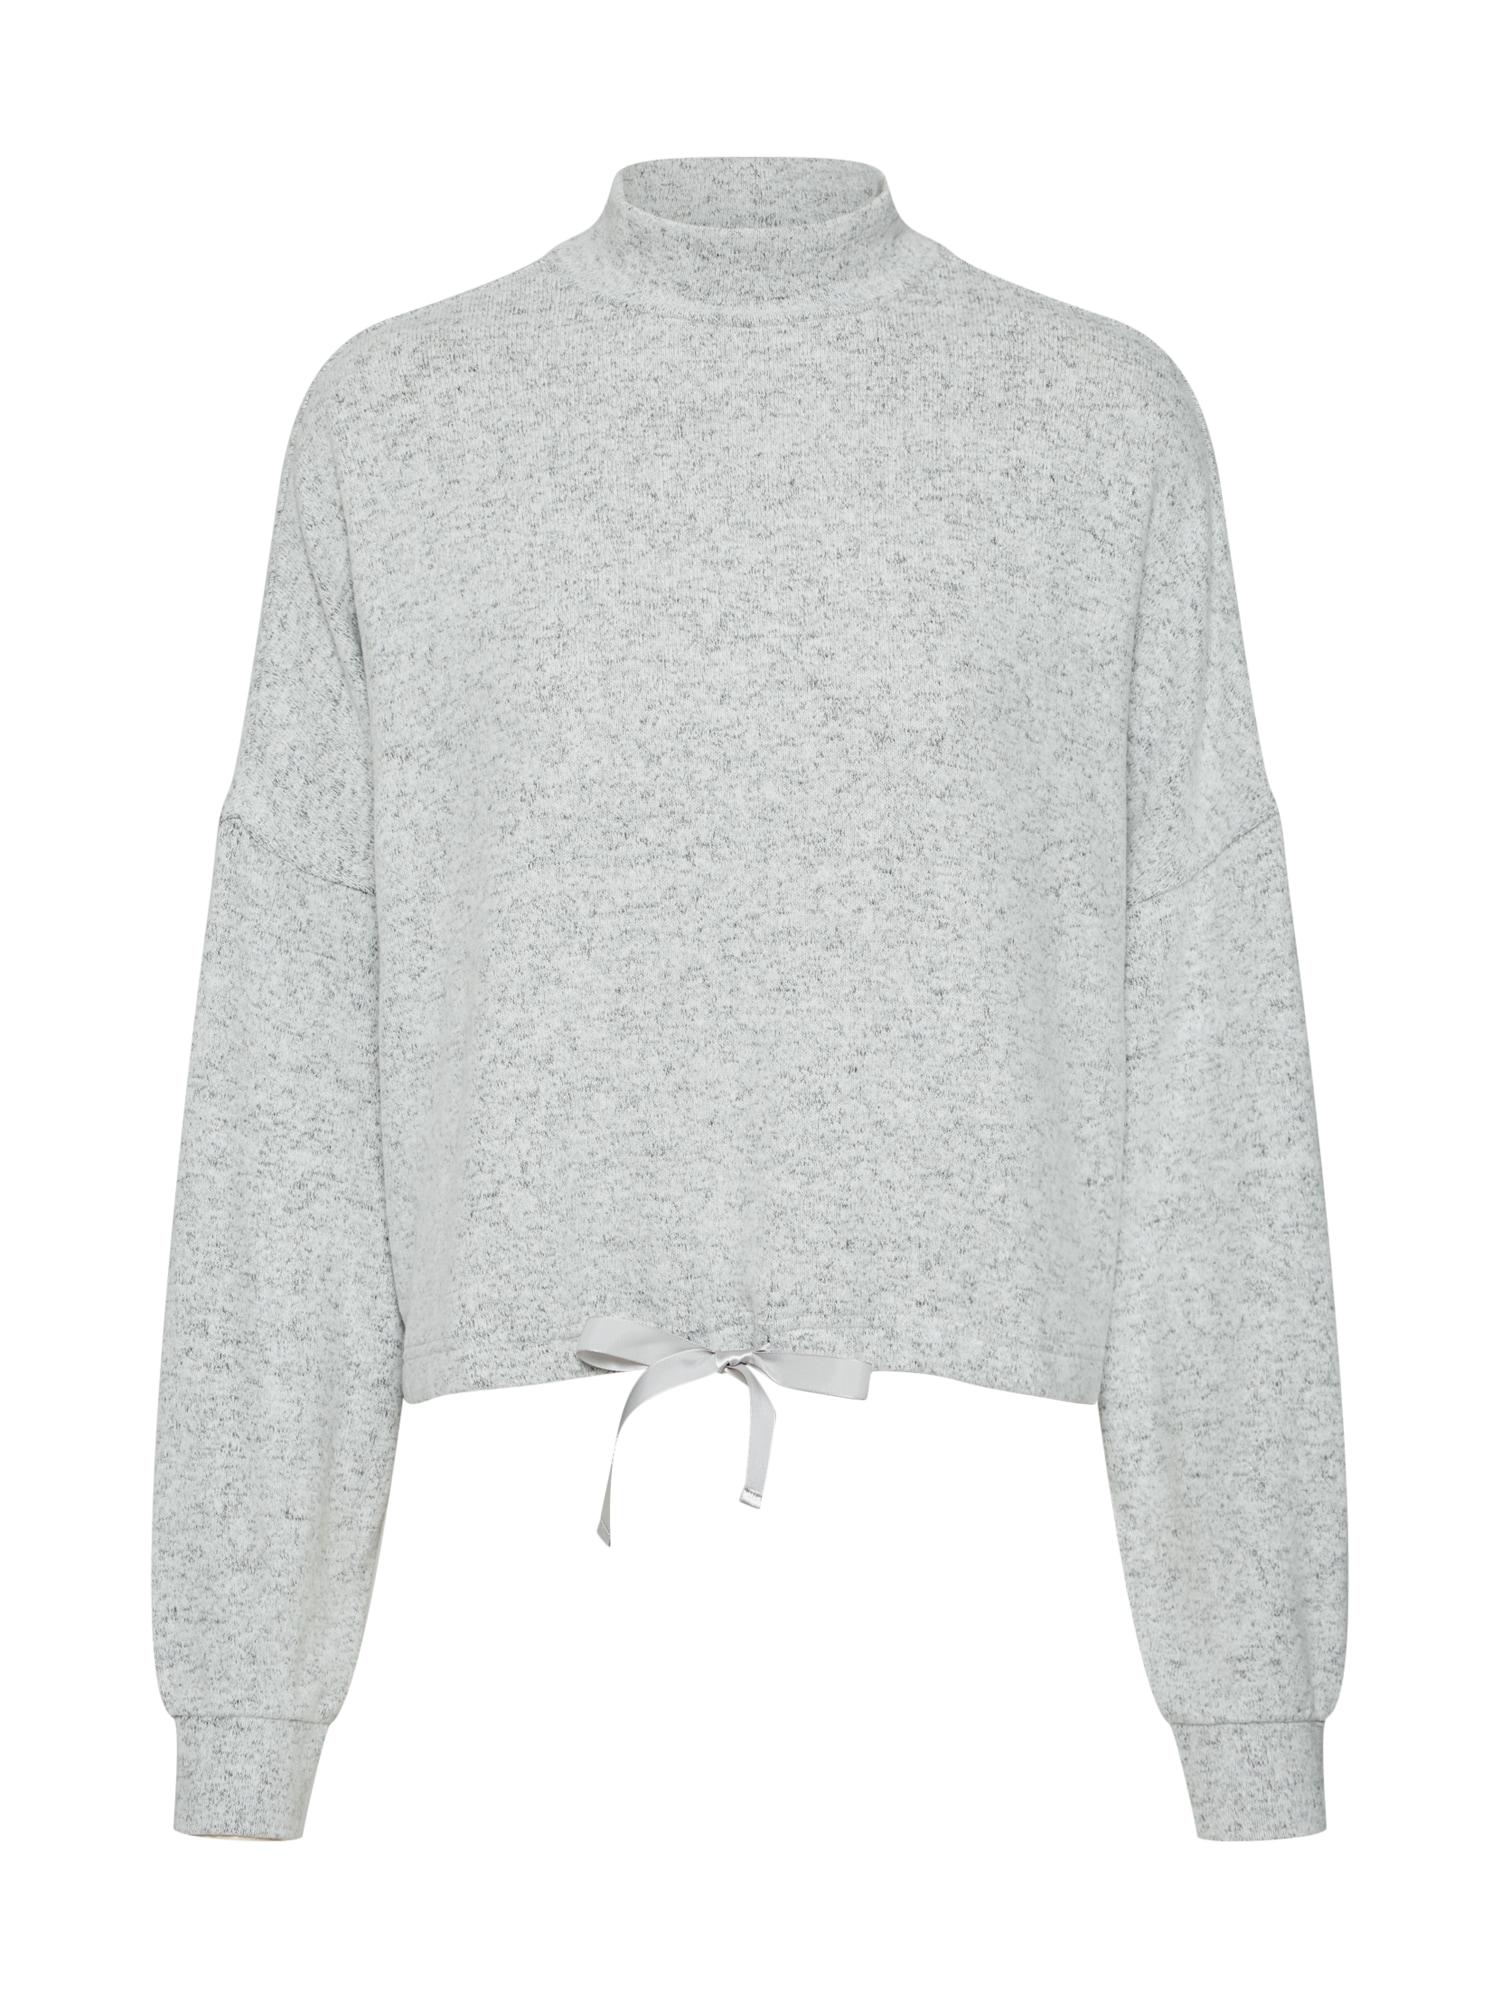 ONLY Megztinis 'MAYE' margai pilka